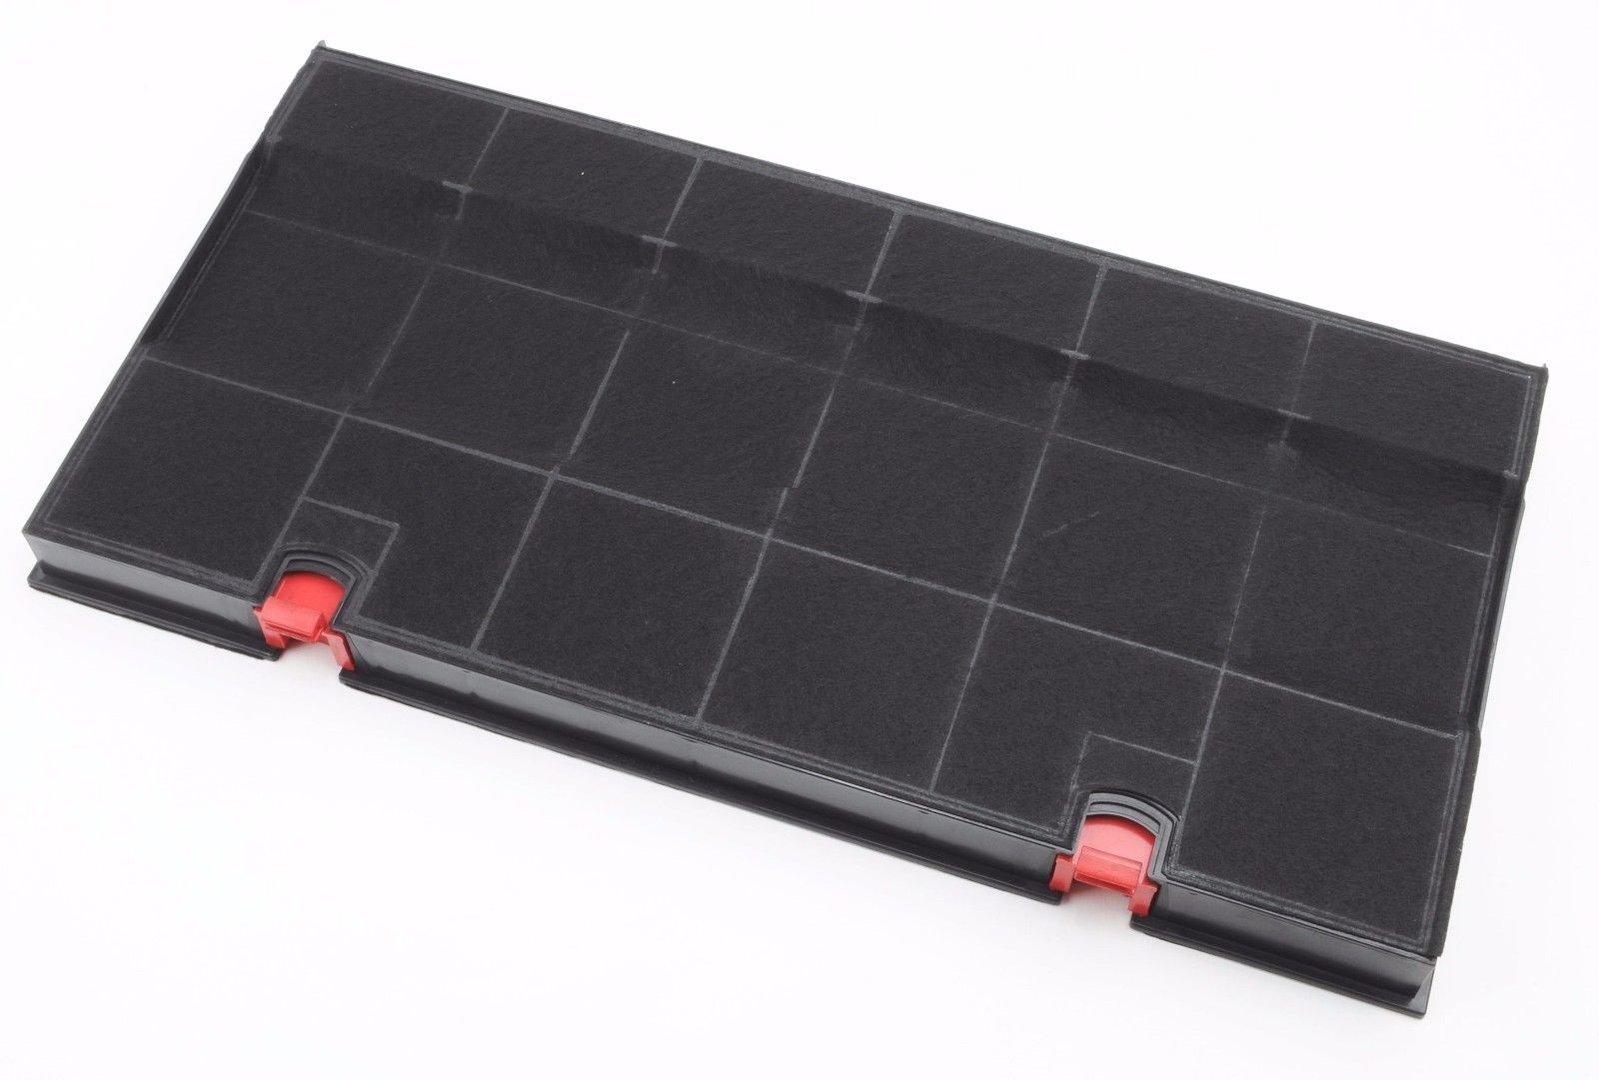 Ikea dunstabzugshaube filter reinigen dunstabzugshaube filter